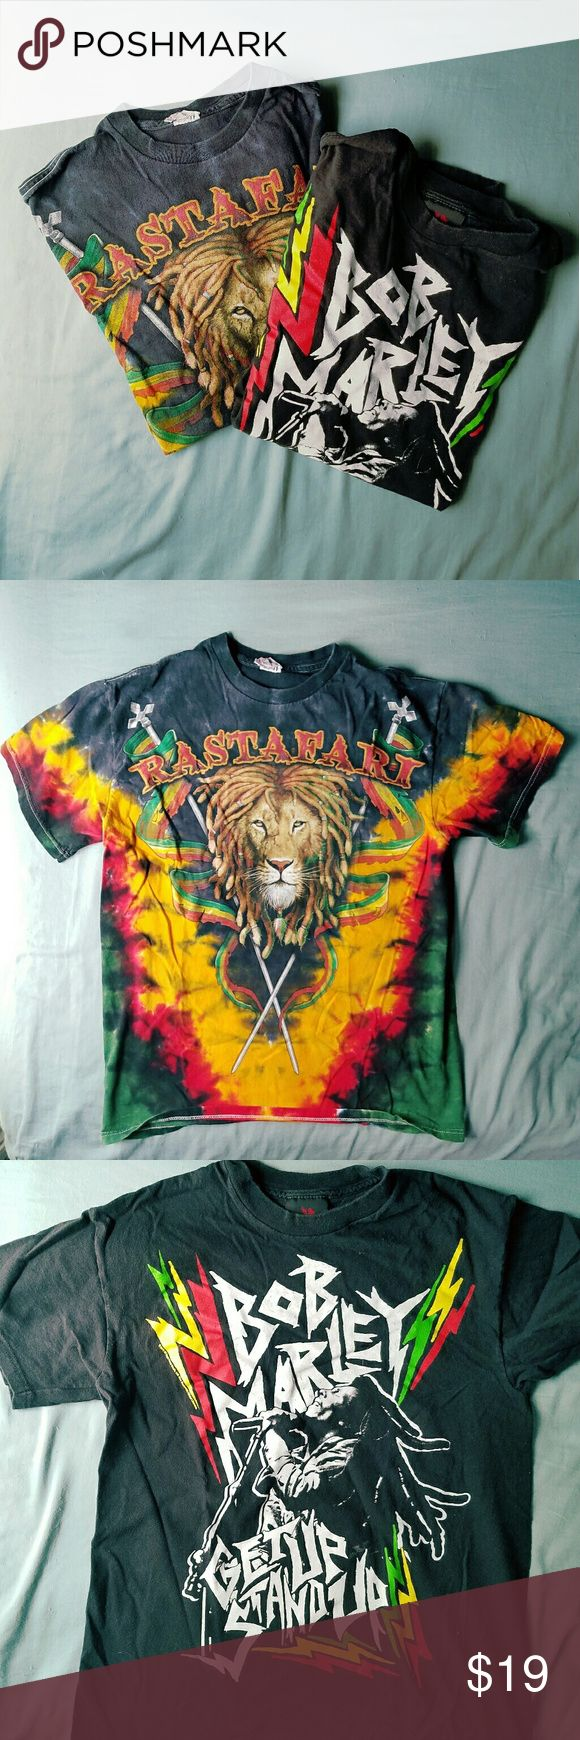 2 T-shirts Rastafari and Bob Marley Both men's size small, gently used. No defects.      Tags Jamaica rasta hippie 420 reggae Shirts Tees - Short Sleeve